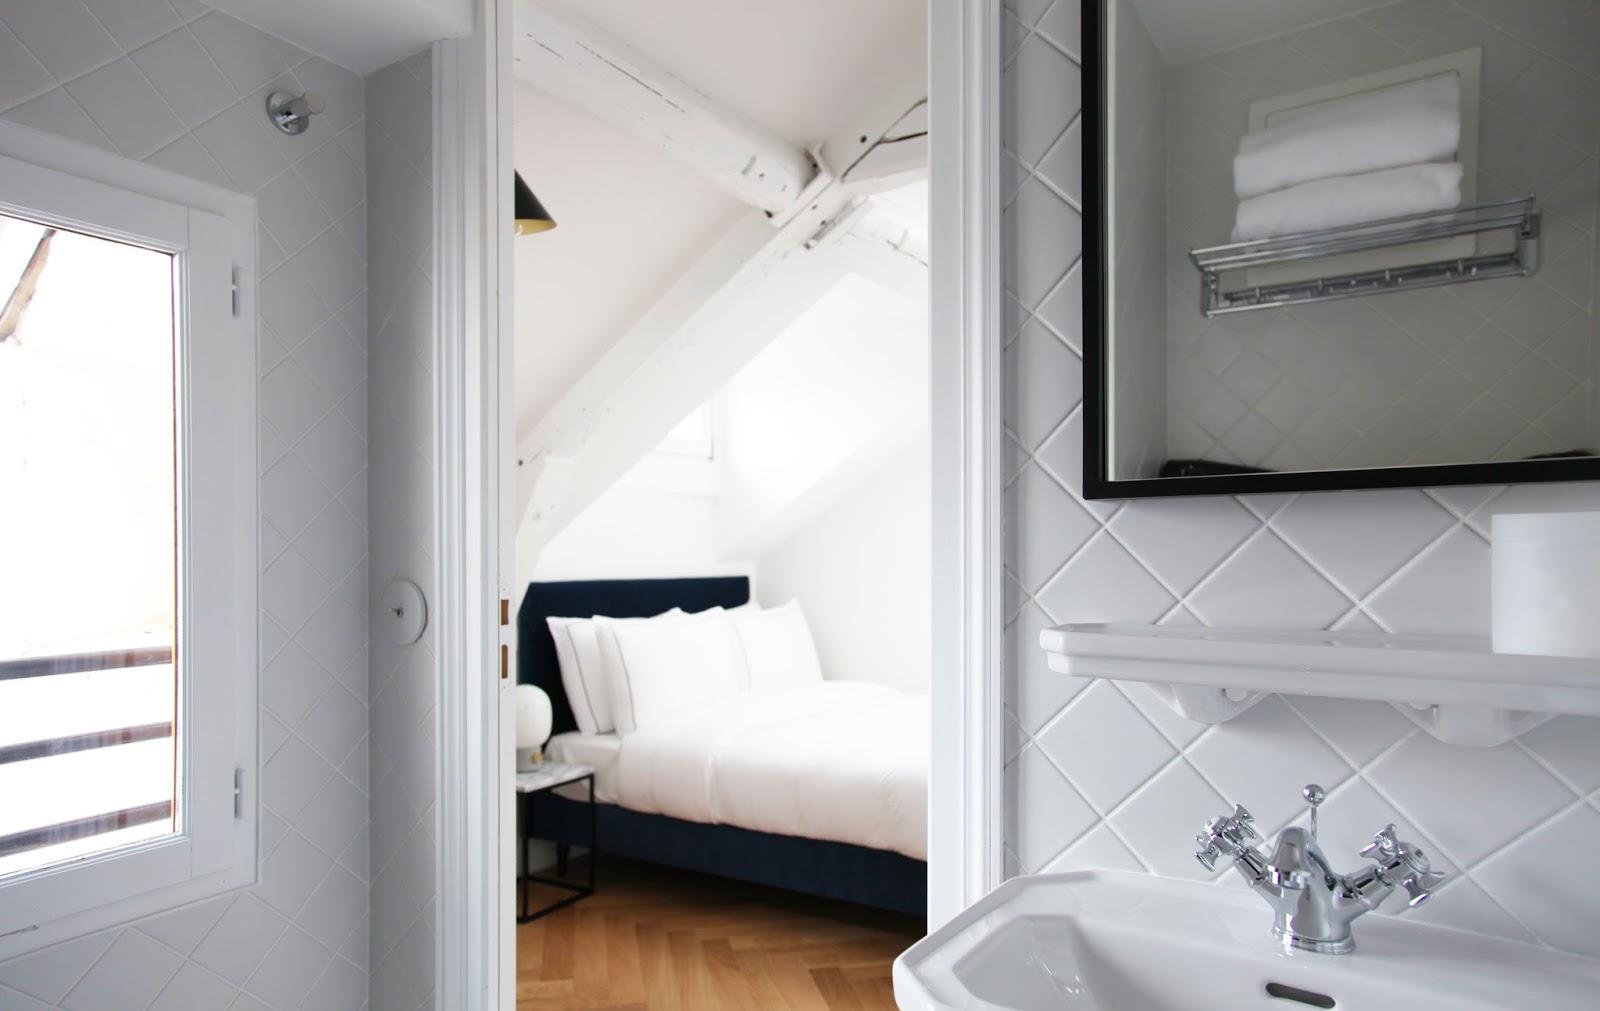 PLANDA_ARCHITECTES_PARIS_RENDEZ_VOUS_HOTEL_BATIGNOLLES_PARIS_DESIGN_IMG_4755